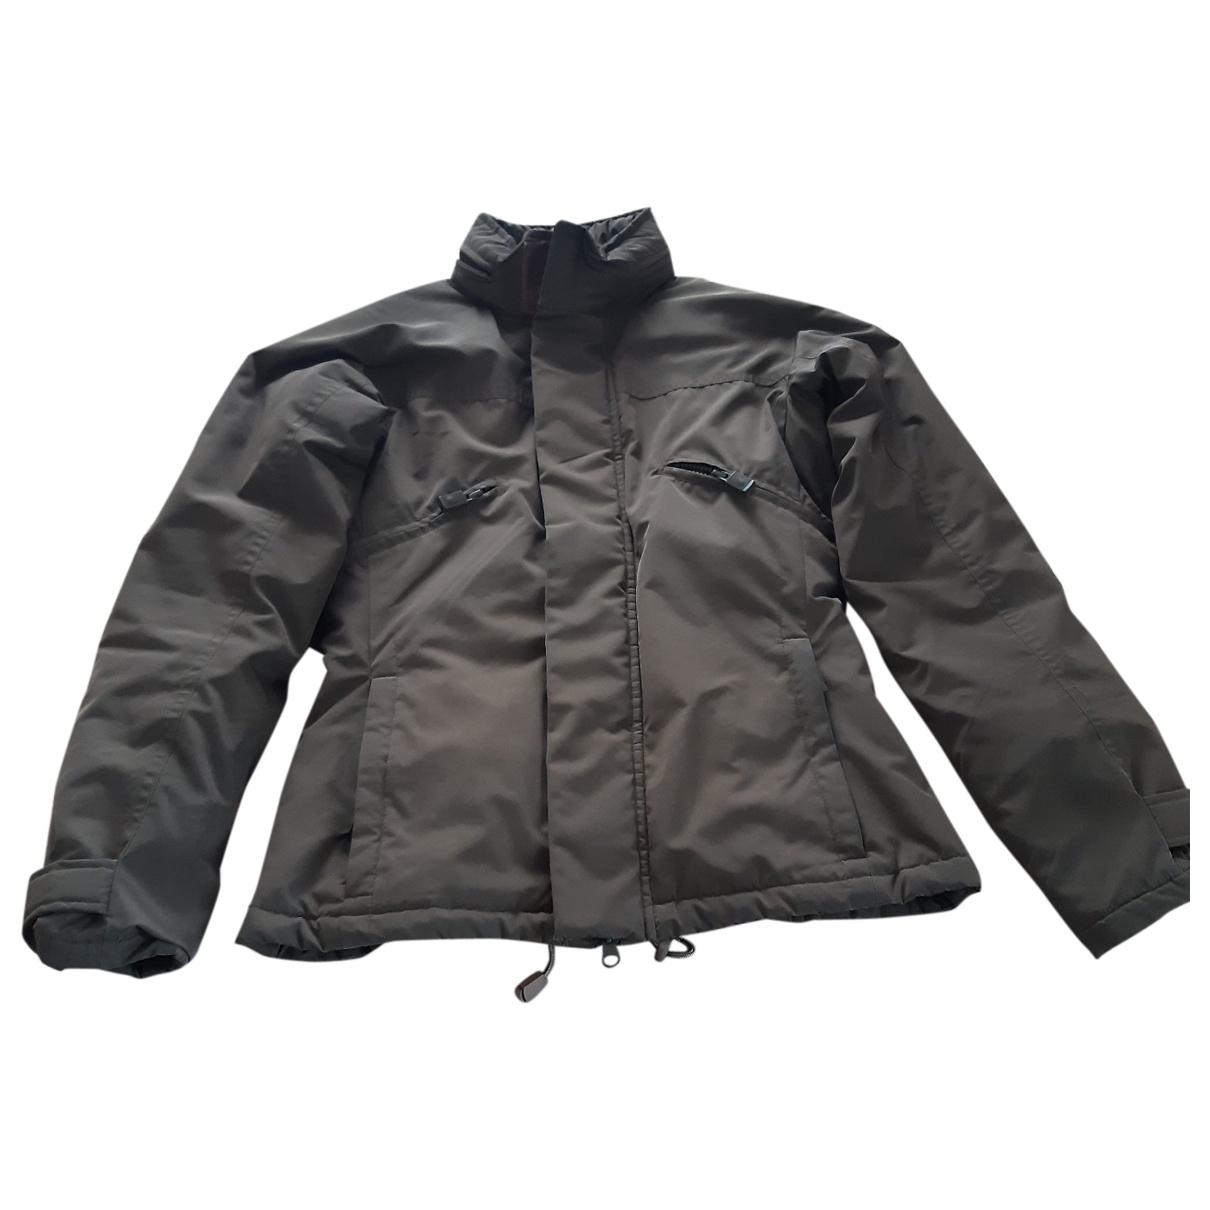 Aspesi \N Green jacket for Women S International